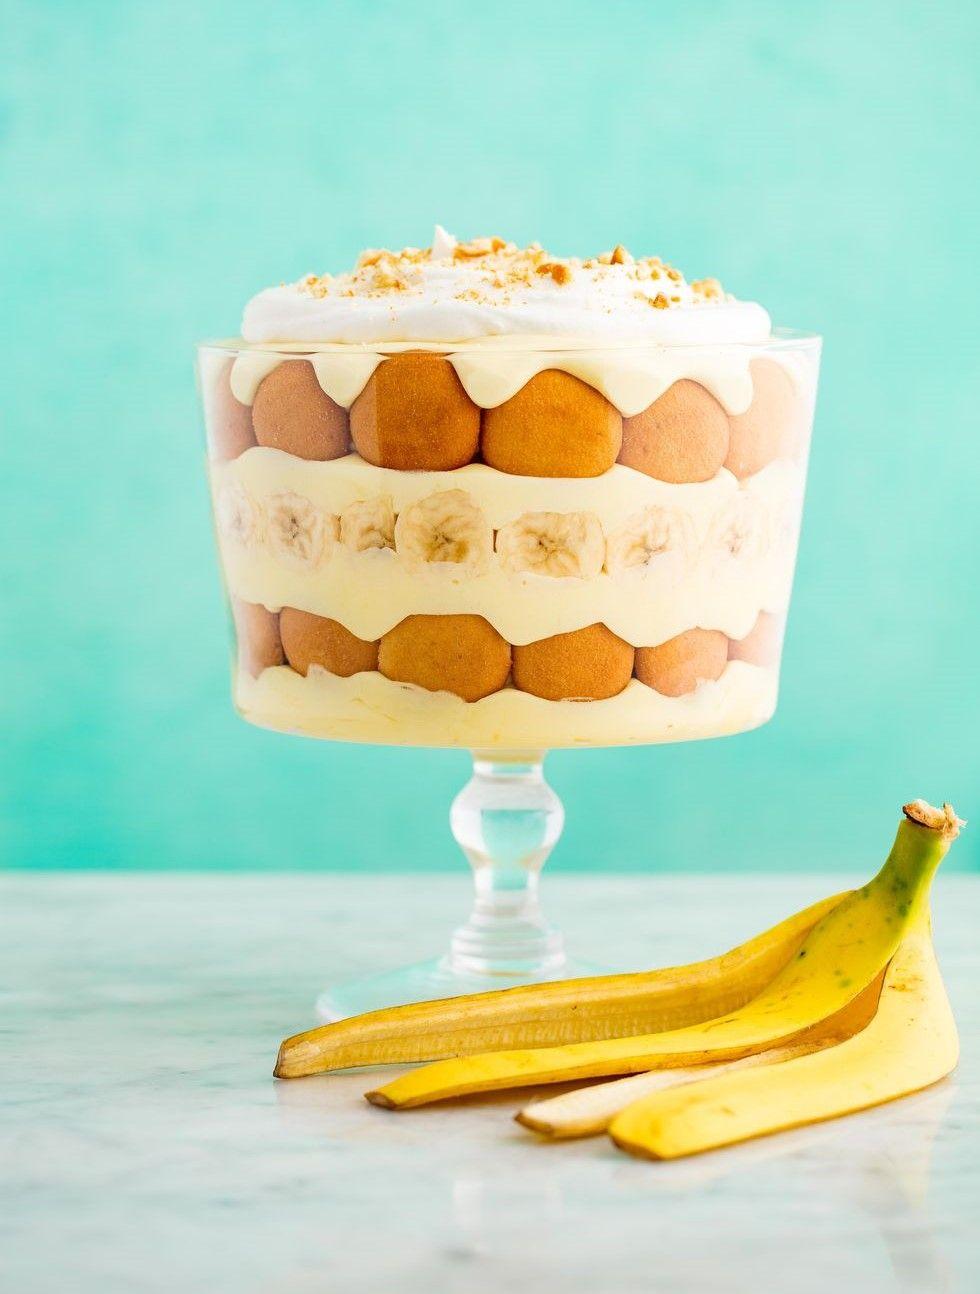 Sederhana dan Bikin Ketagihan, Ini Aneka Dessert Berbahan Pisang